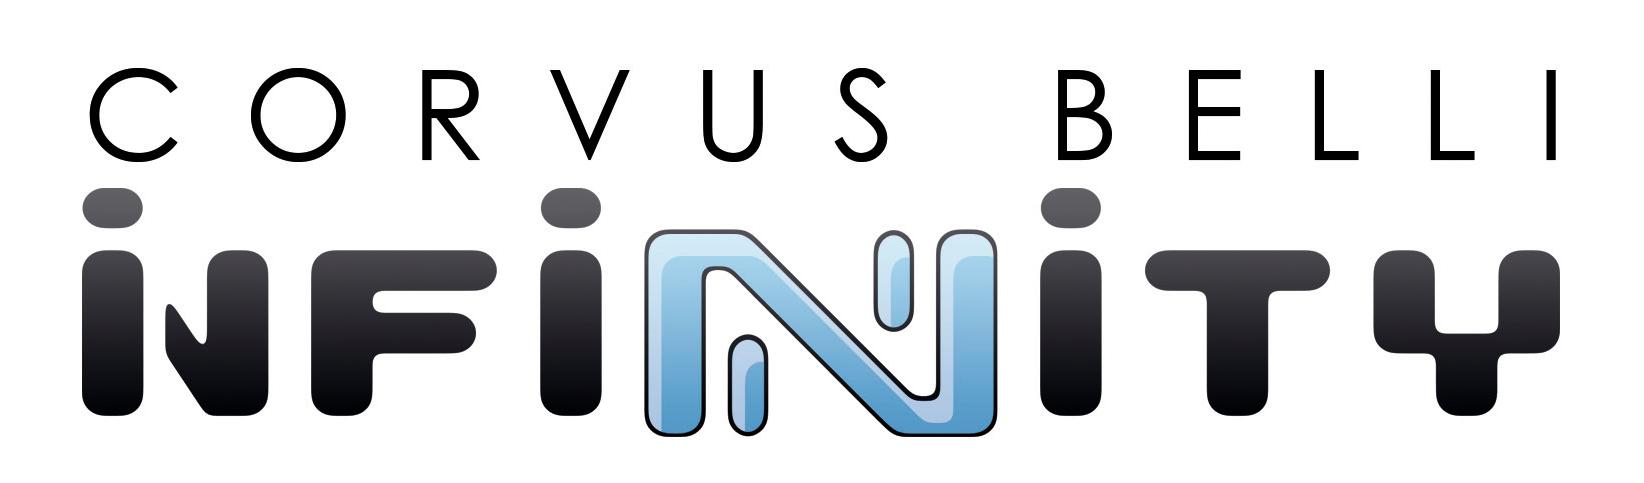 logotipo-infinity-2014-n3b.jpg